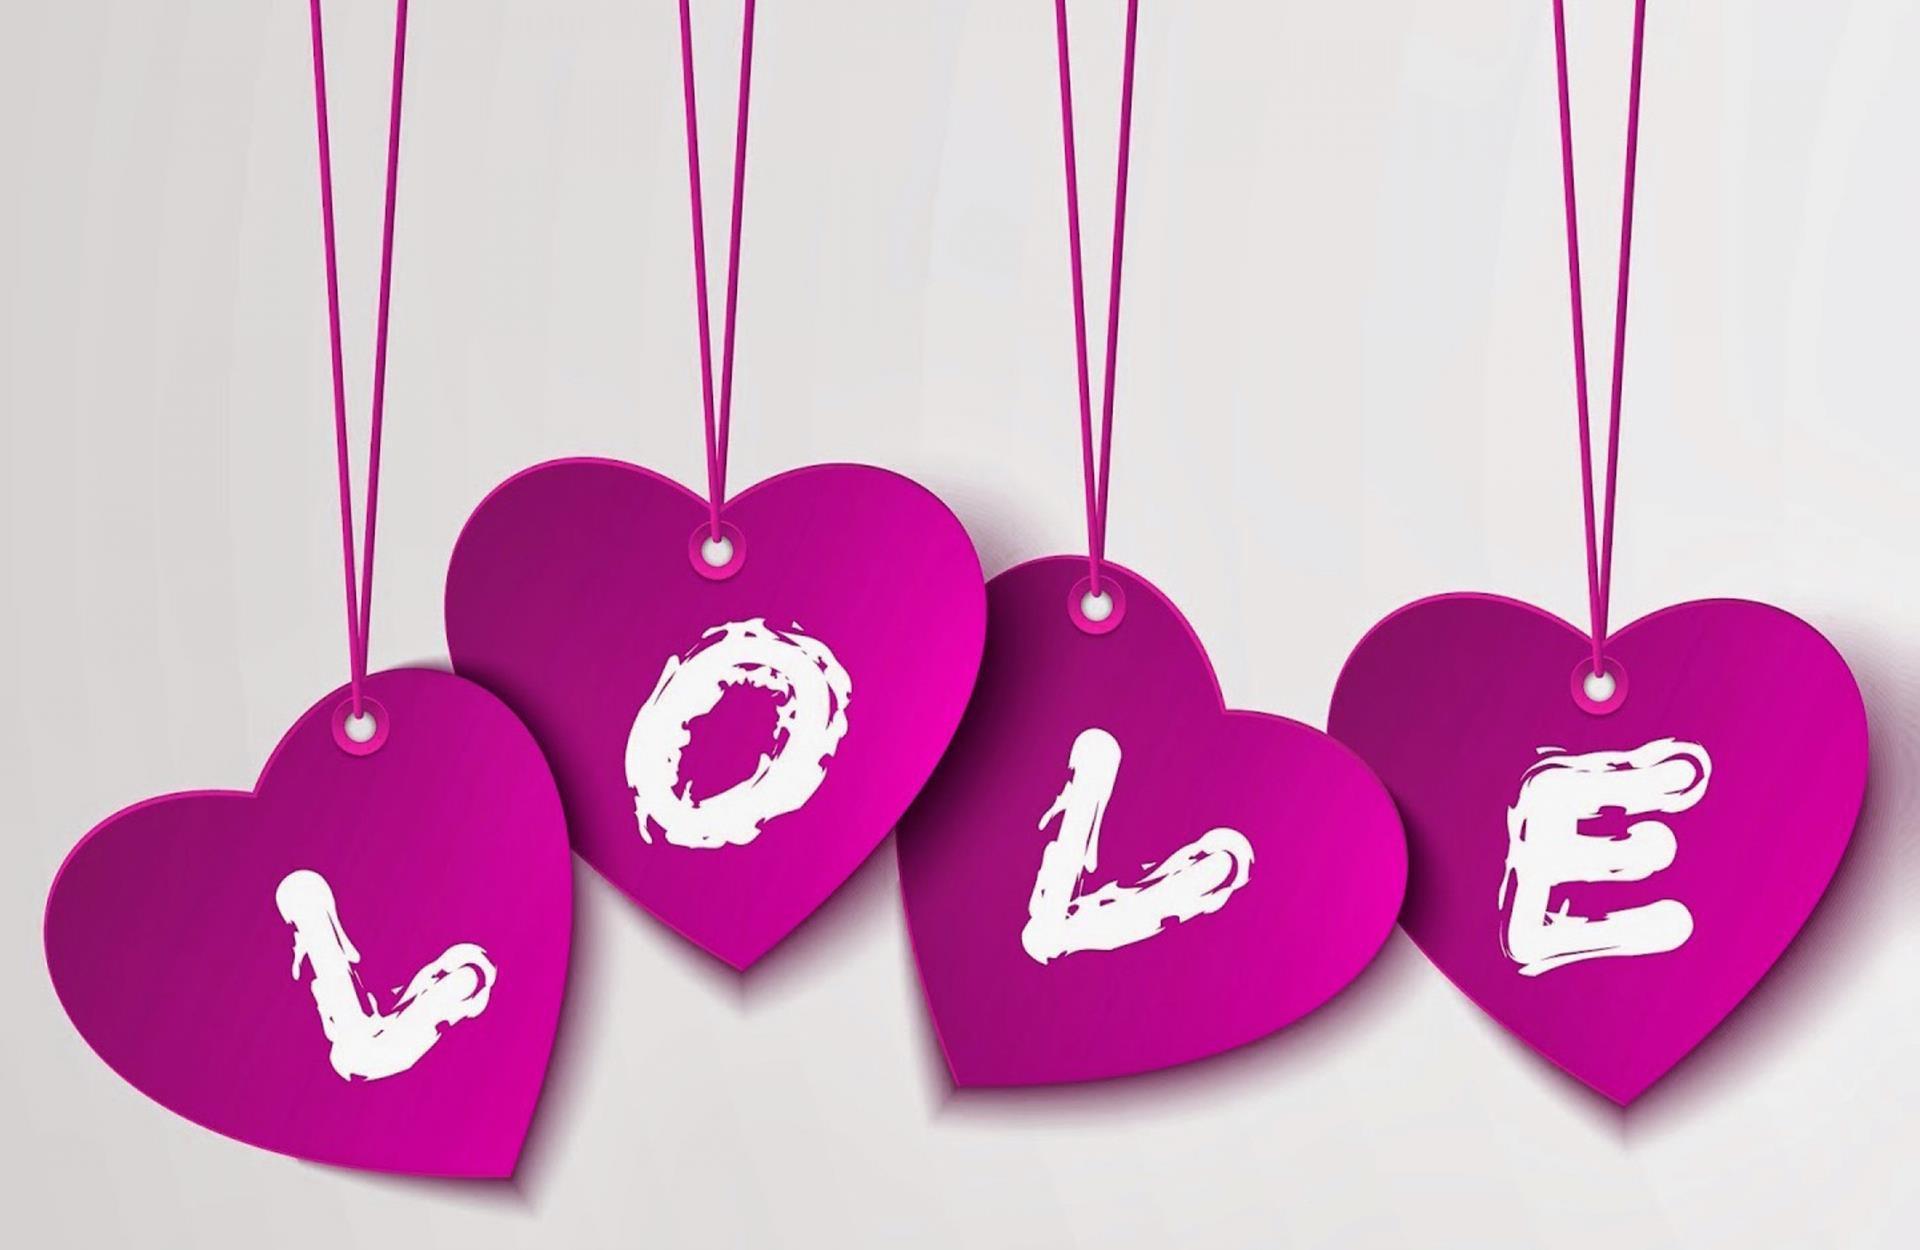 Love Name Wallpapers - Wallpaper Cave